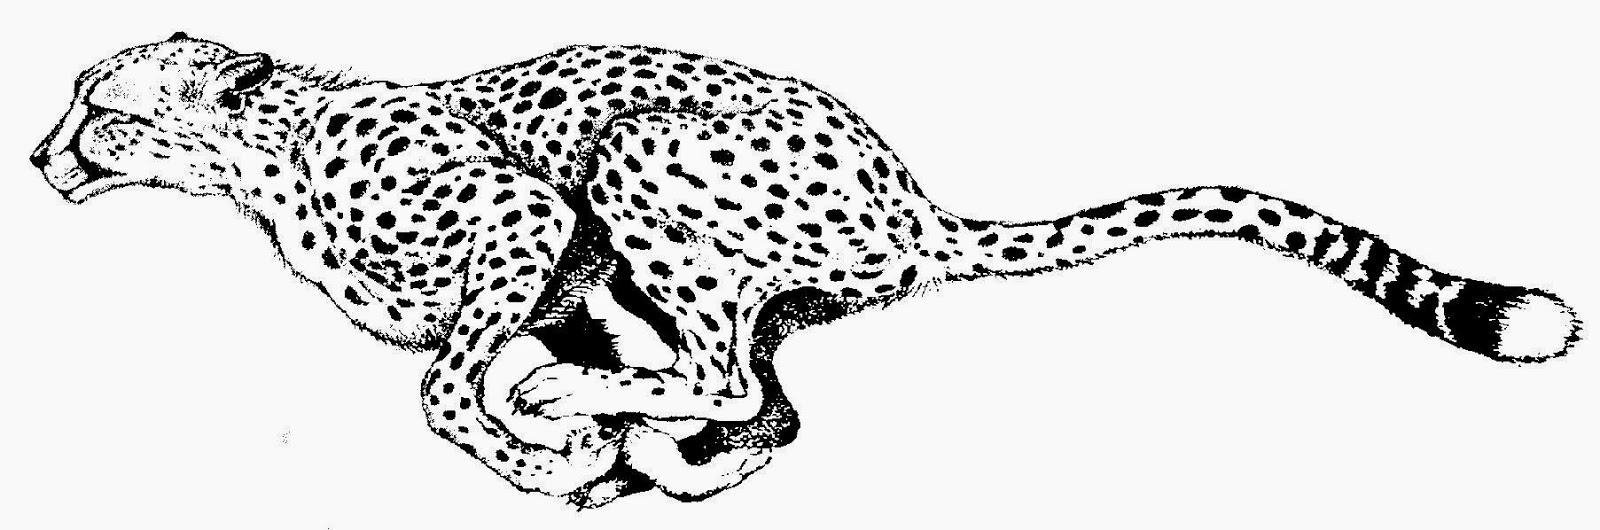 Cheetah clipart kid. Print black and white